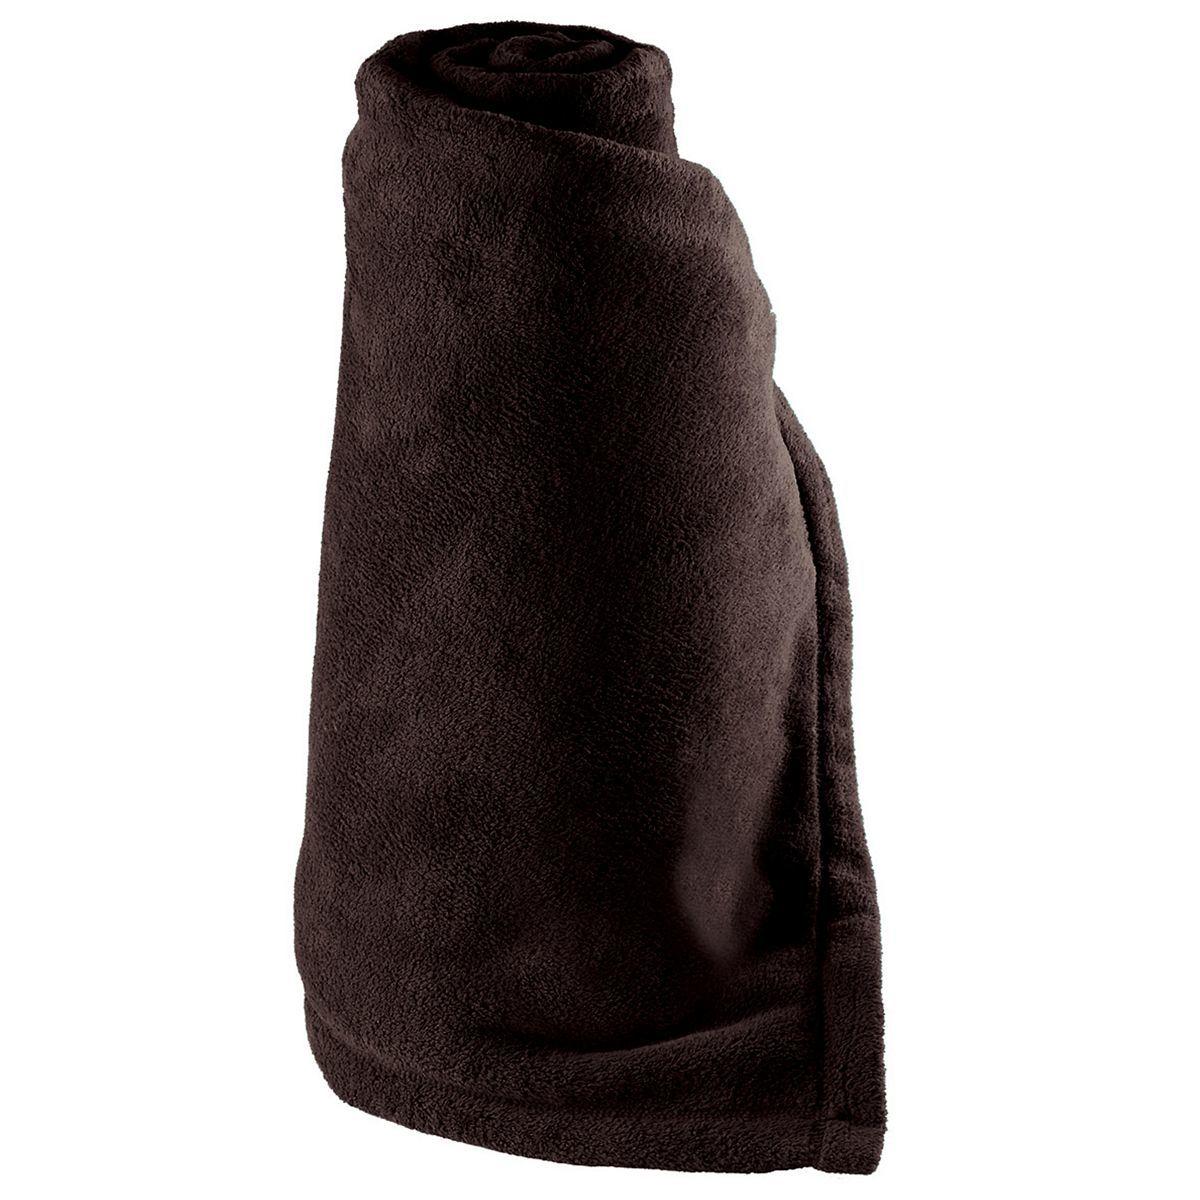 Tailgate Blanket - BLACK